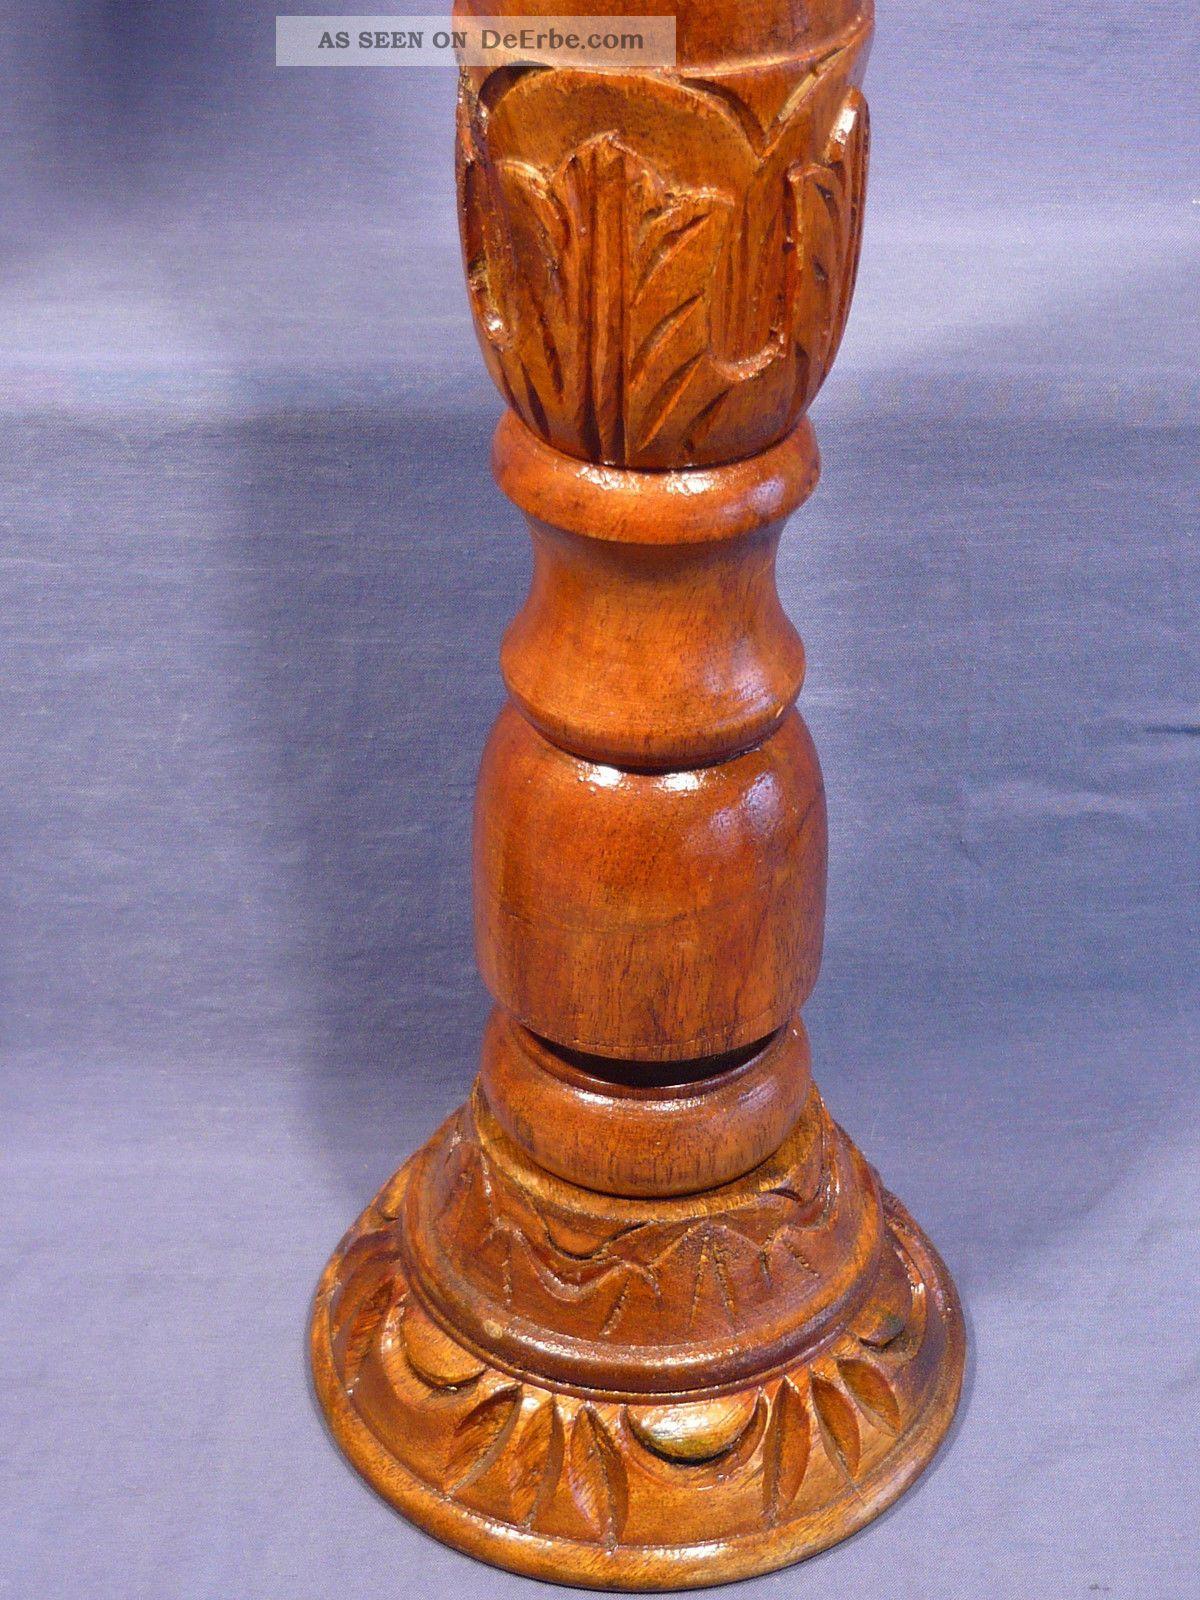 Kerzenständer Holz Geschnitzt ~ Alte Große Holz Kerzenständer Gedrechselt, Geschnitzt Holzarbeiten